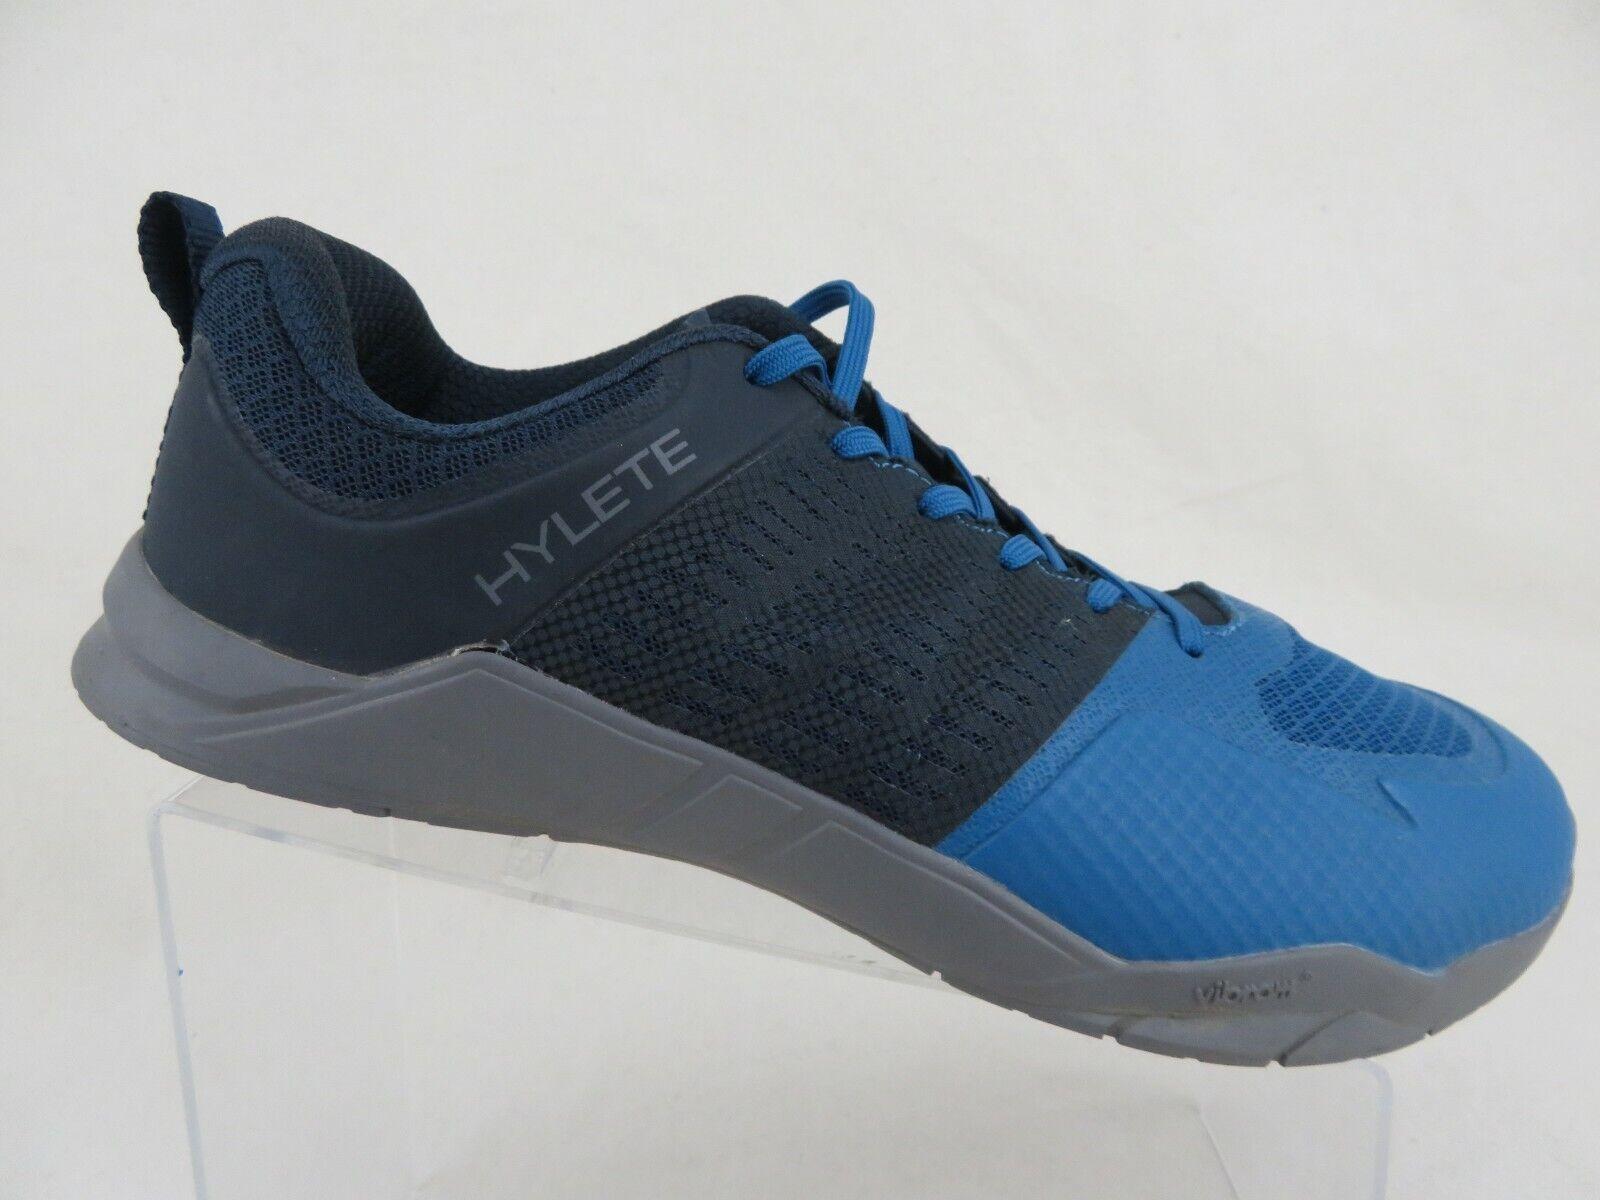 Hylete curcuit Azul Talla 11 hombres Cross-Training zapatos